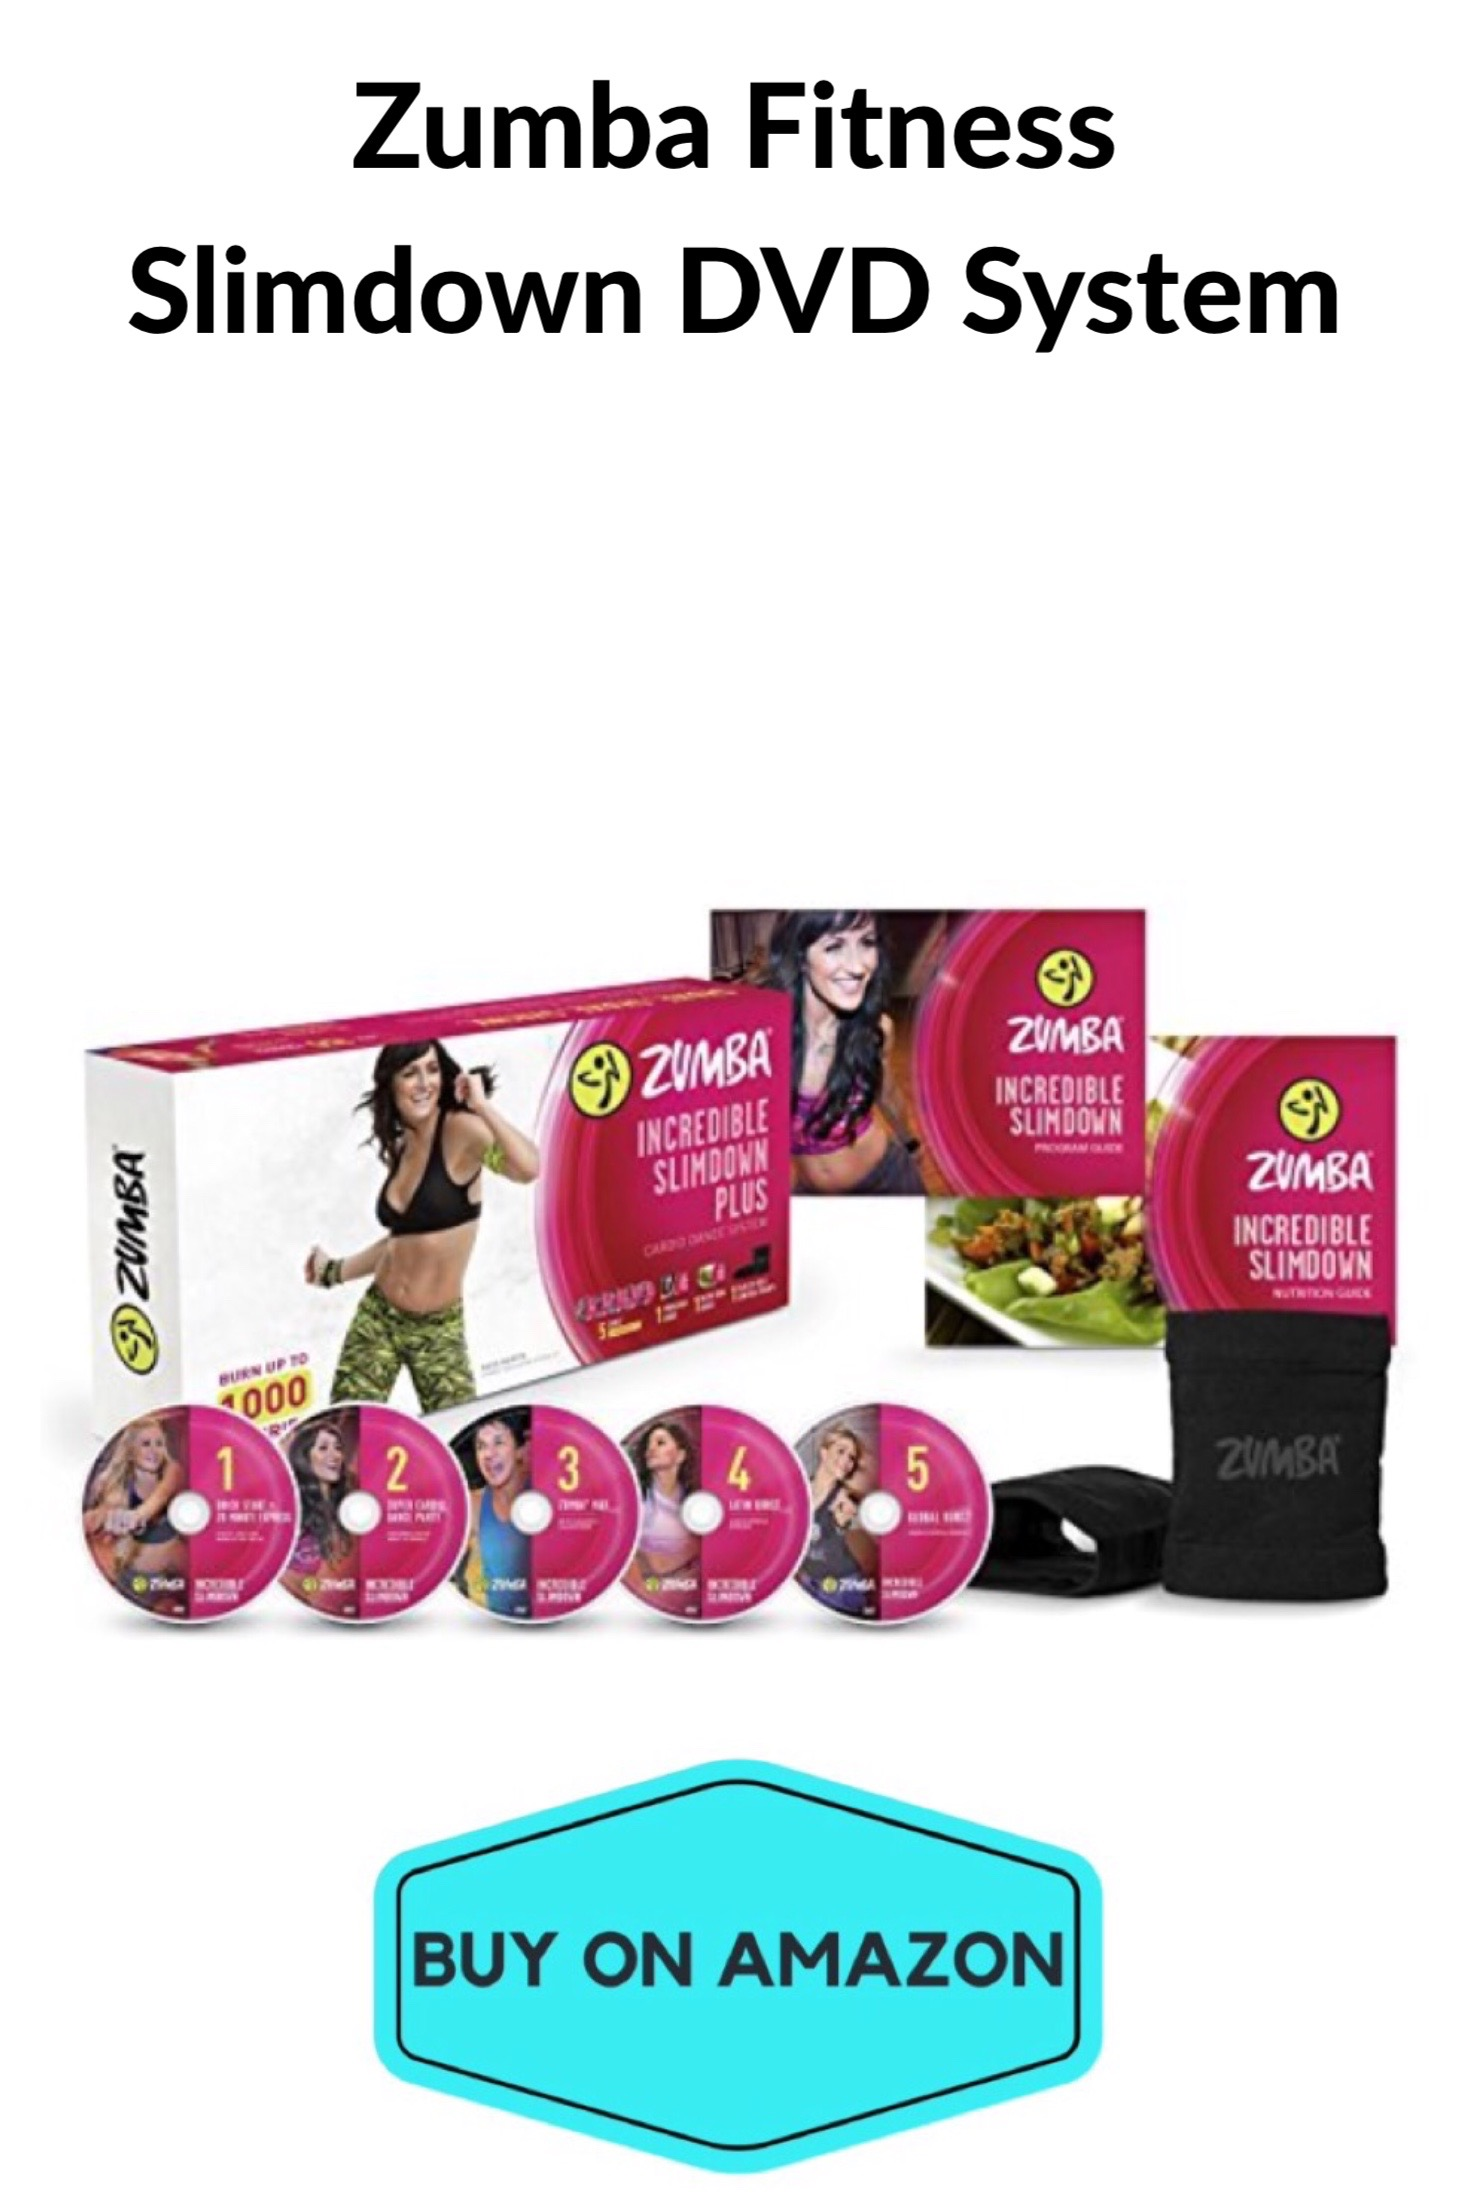 Zumba Fitness Slimdown DVD Set